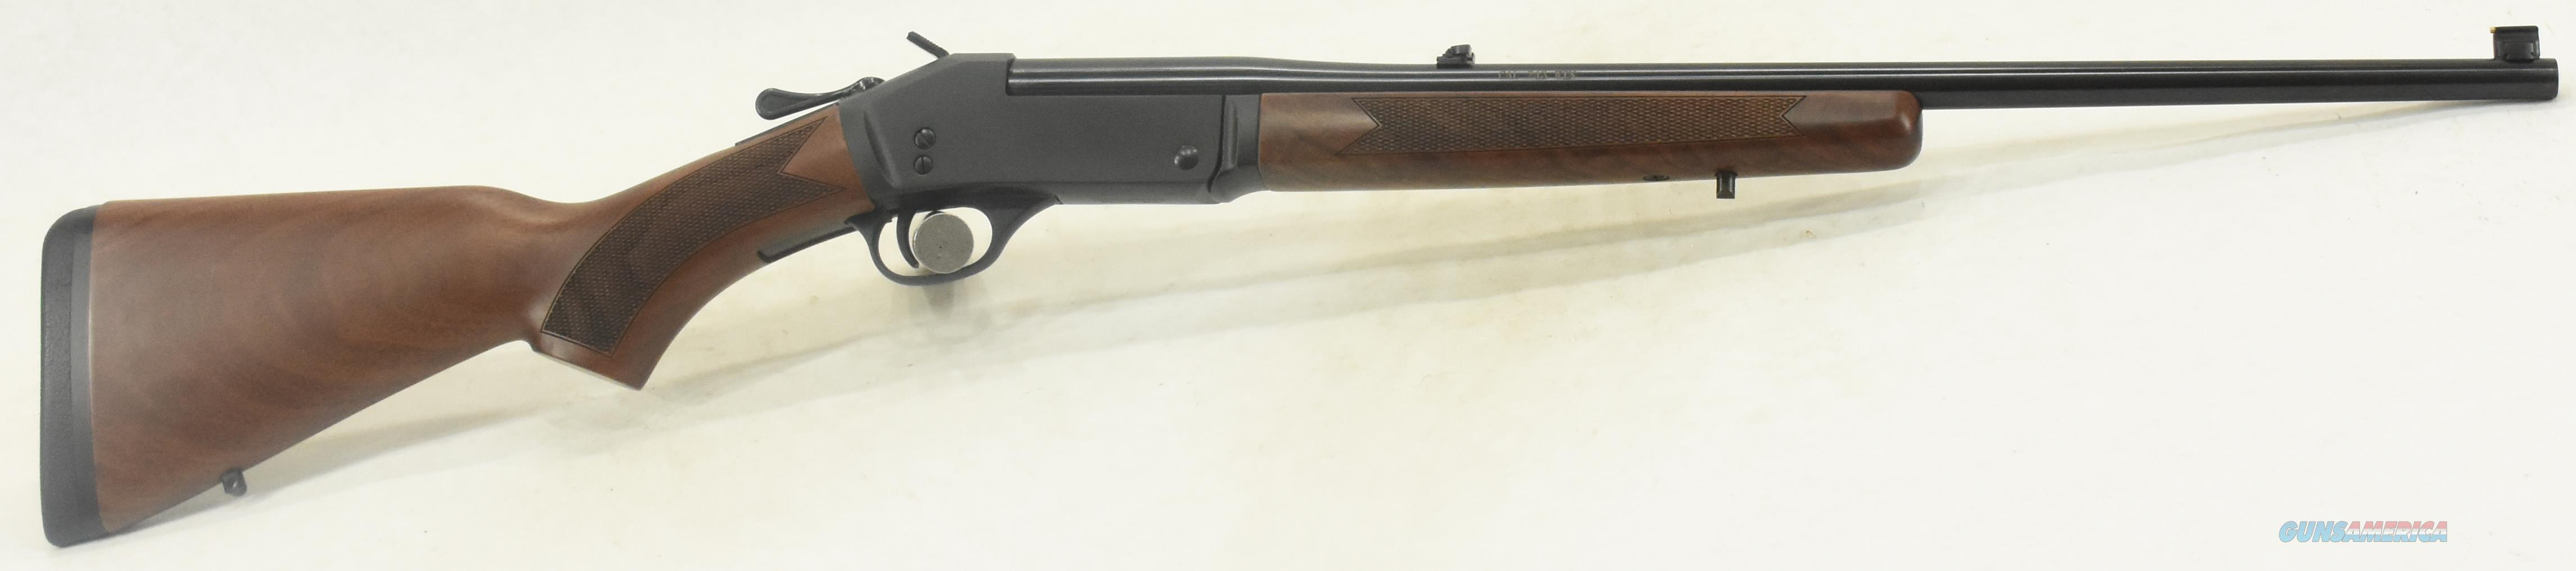 Singleshot Youth 243Win 20In  H015Y-243  Guns > Rifles > Henry Rifles - Replica